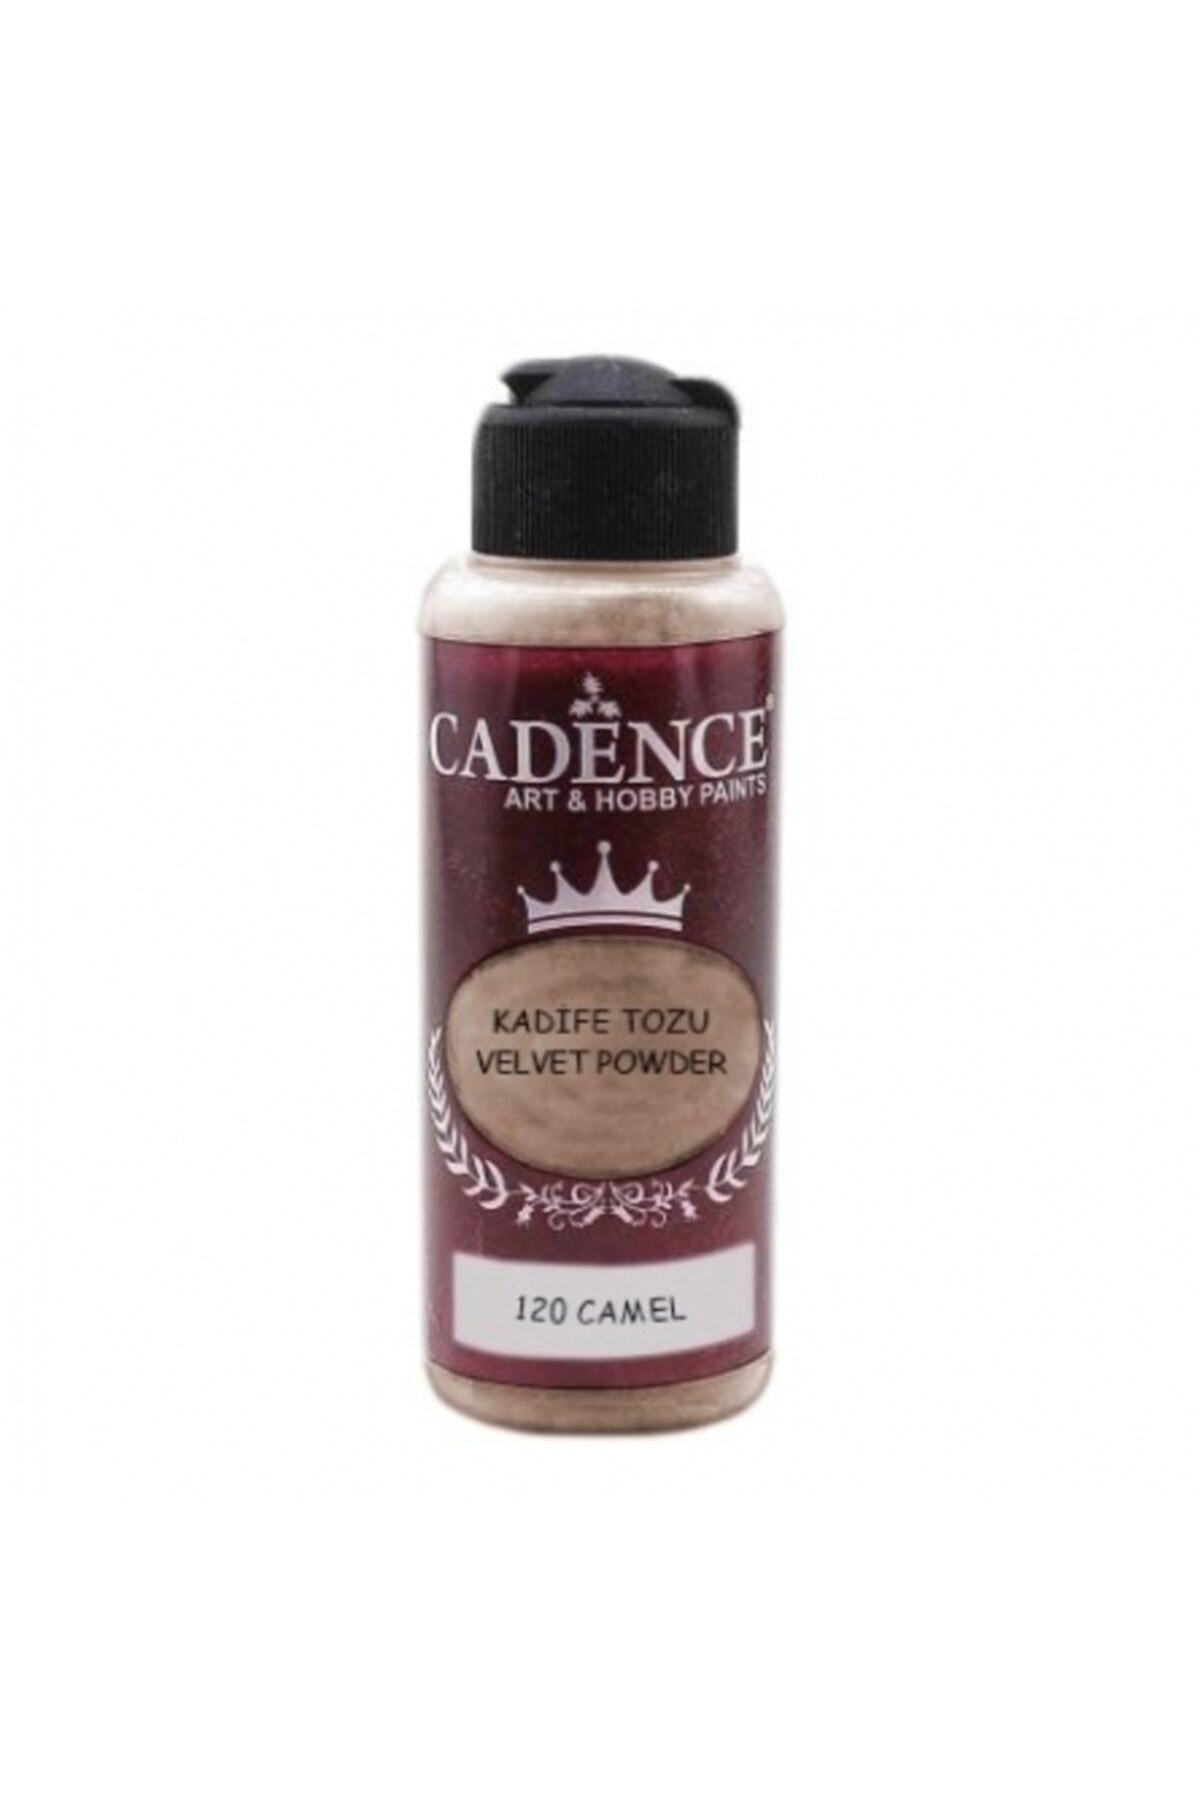 Cadence Kadife Tozu Camel 120